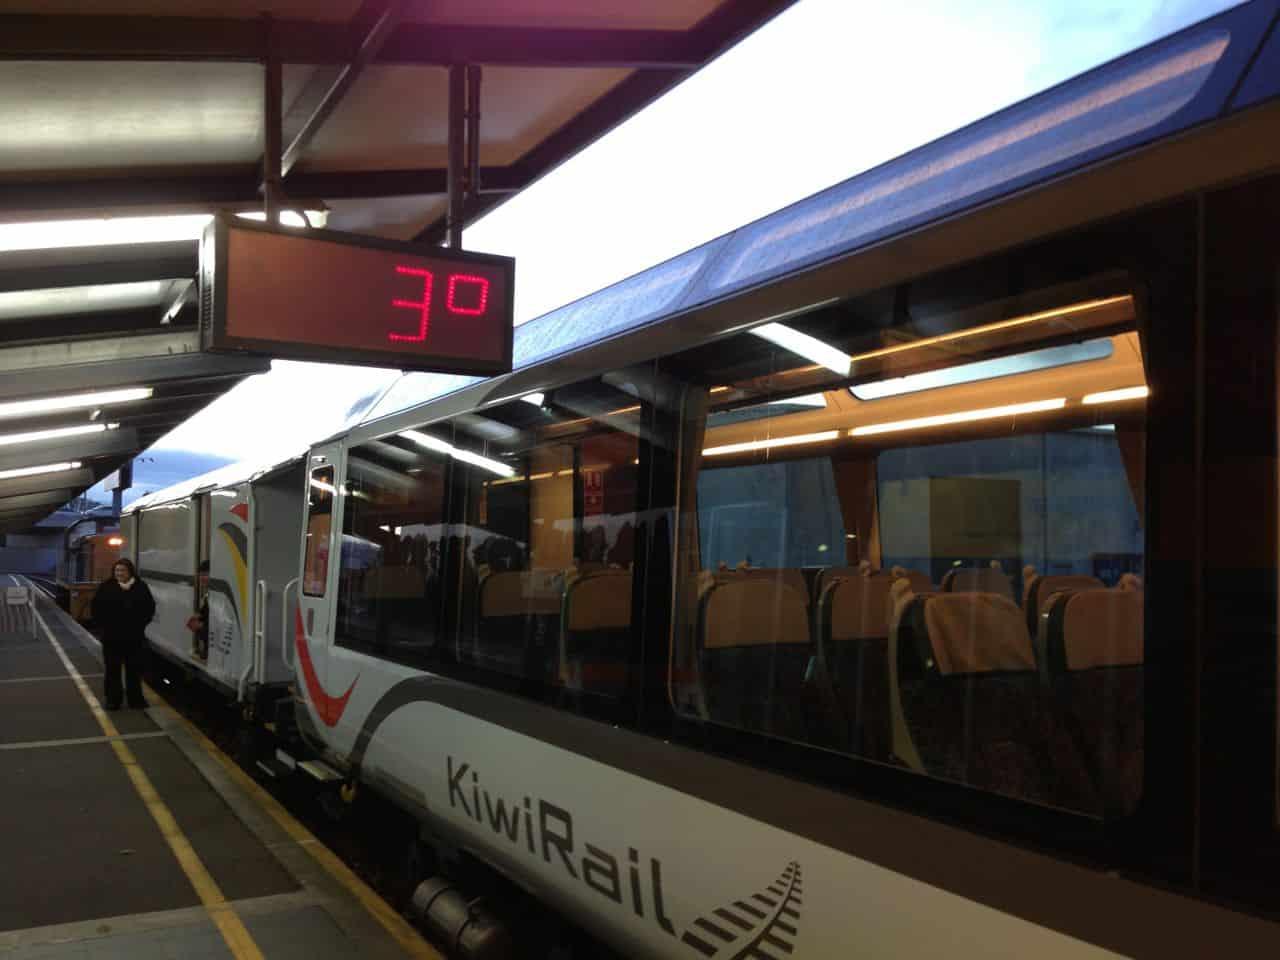 TranzAlpine togrejse - Christchurch til Greymouth